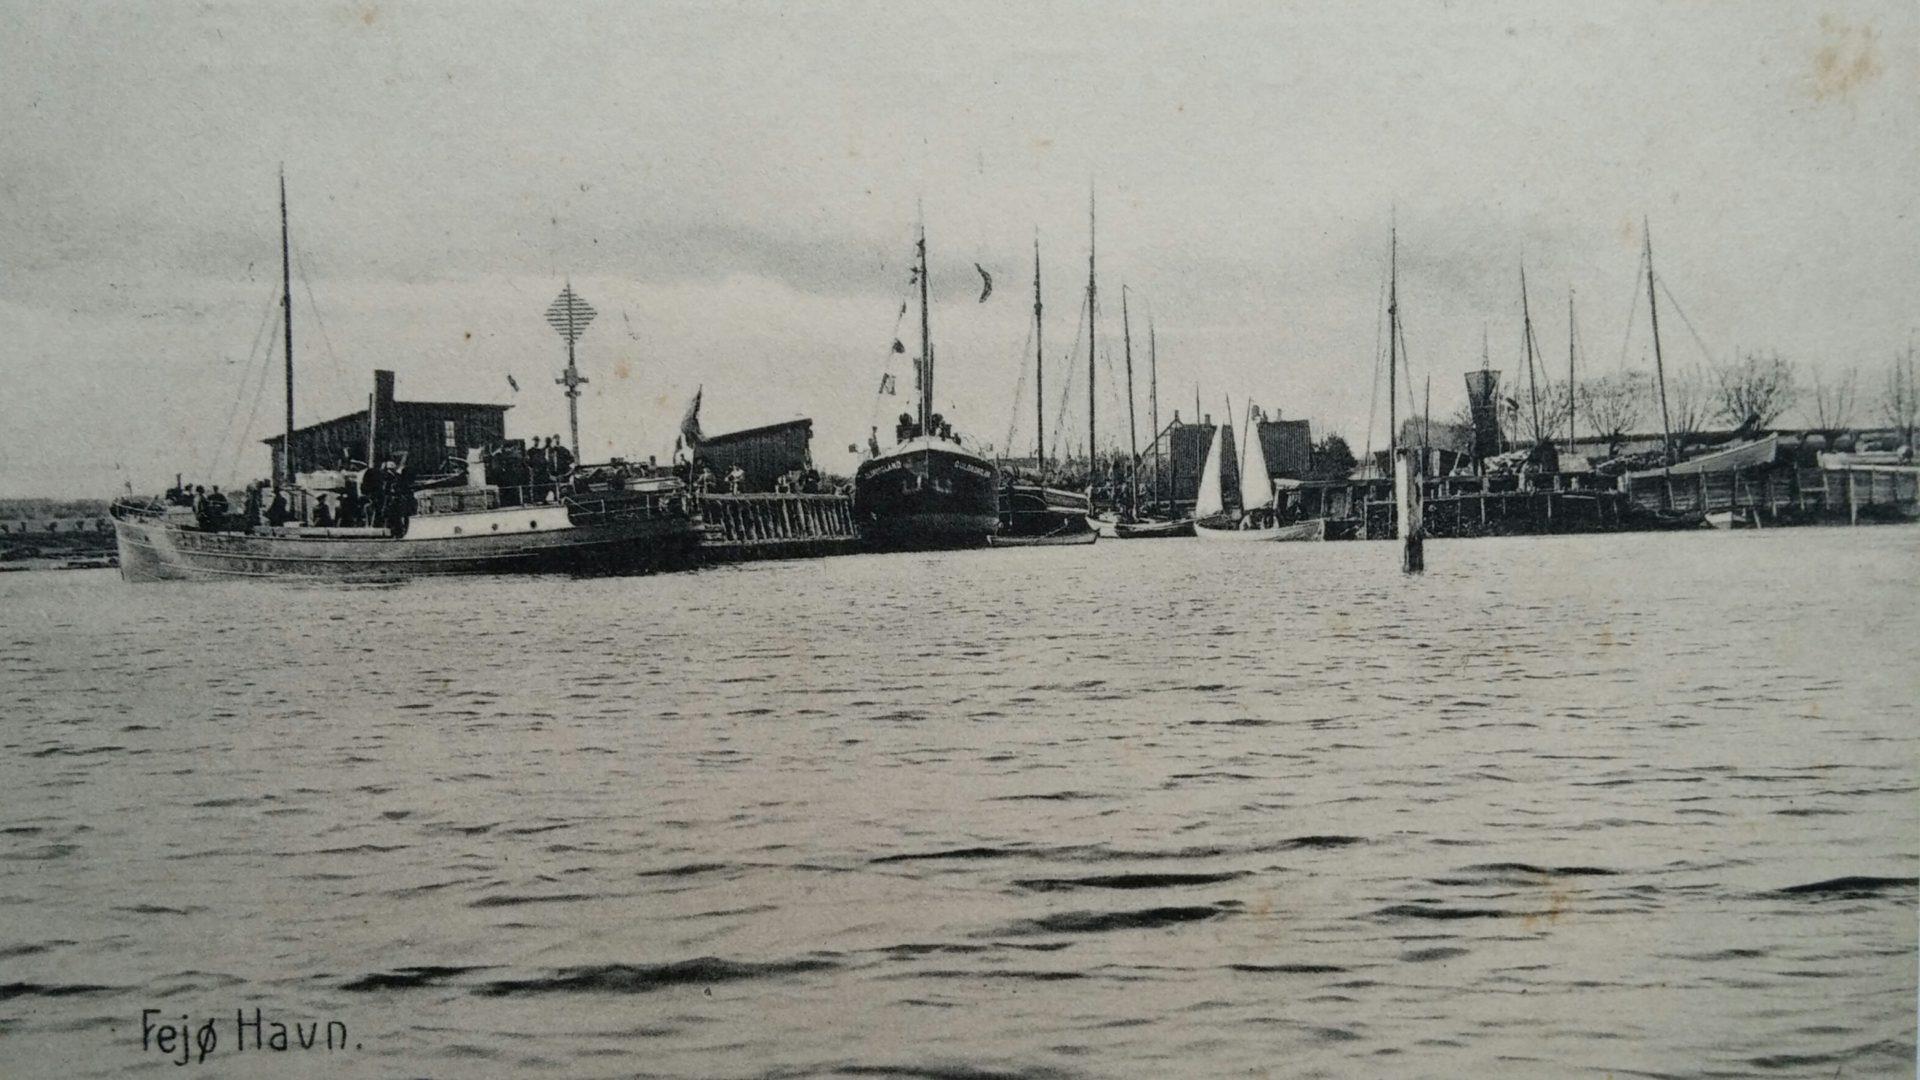 Dybvig postkort sendt 30.7.1907